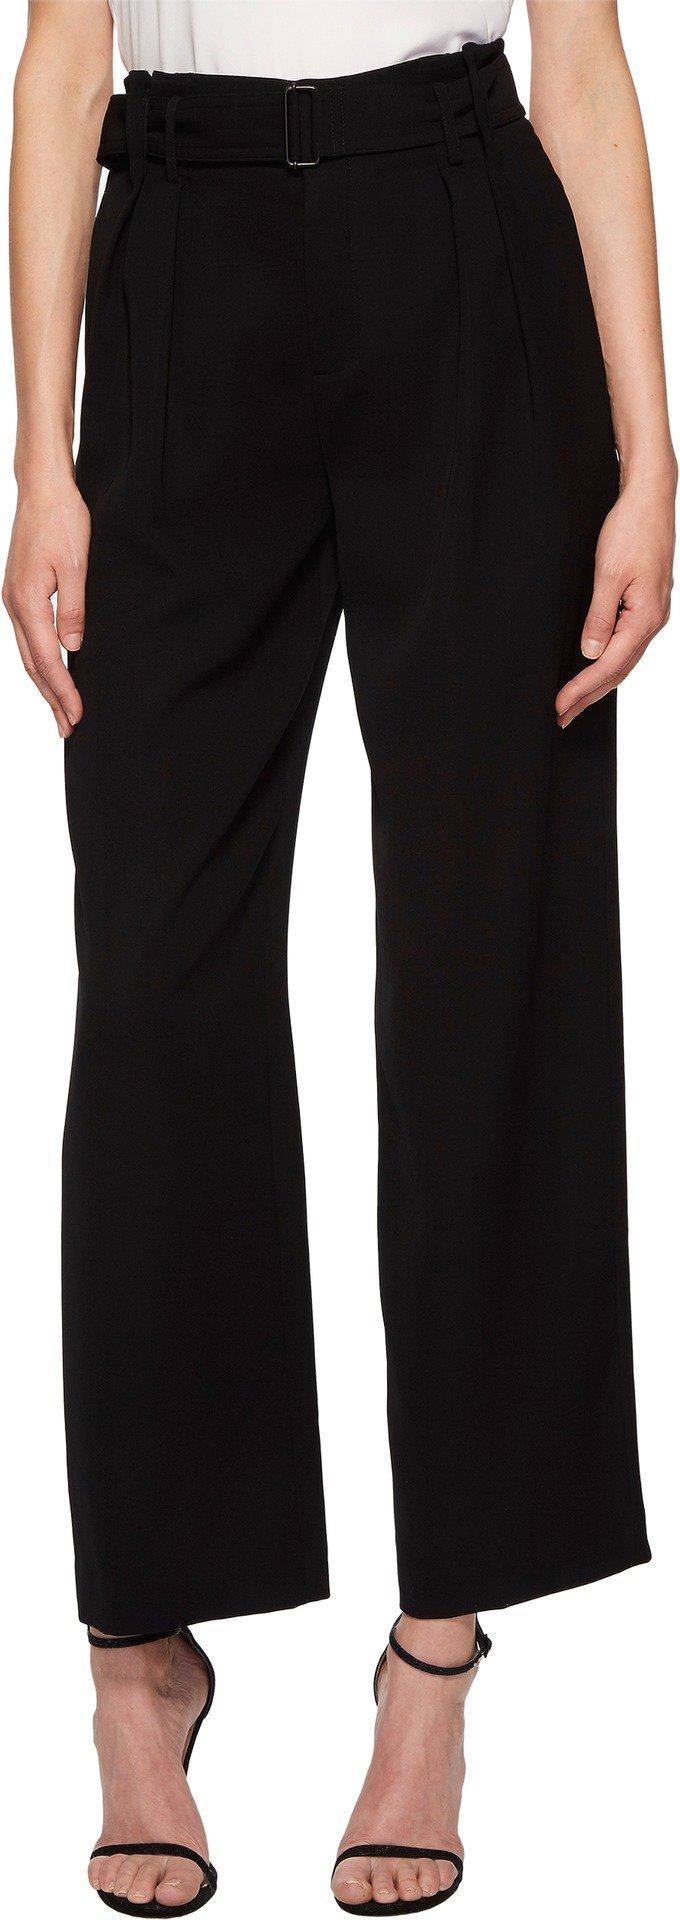 Vince Women's Belted Wide Leg Pants Black 6